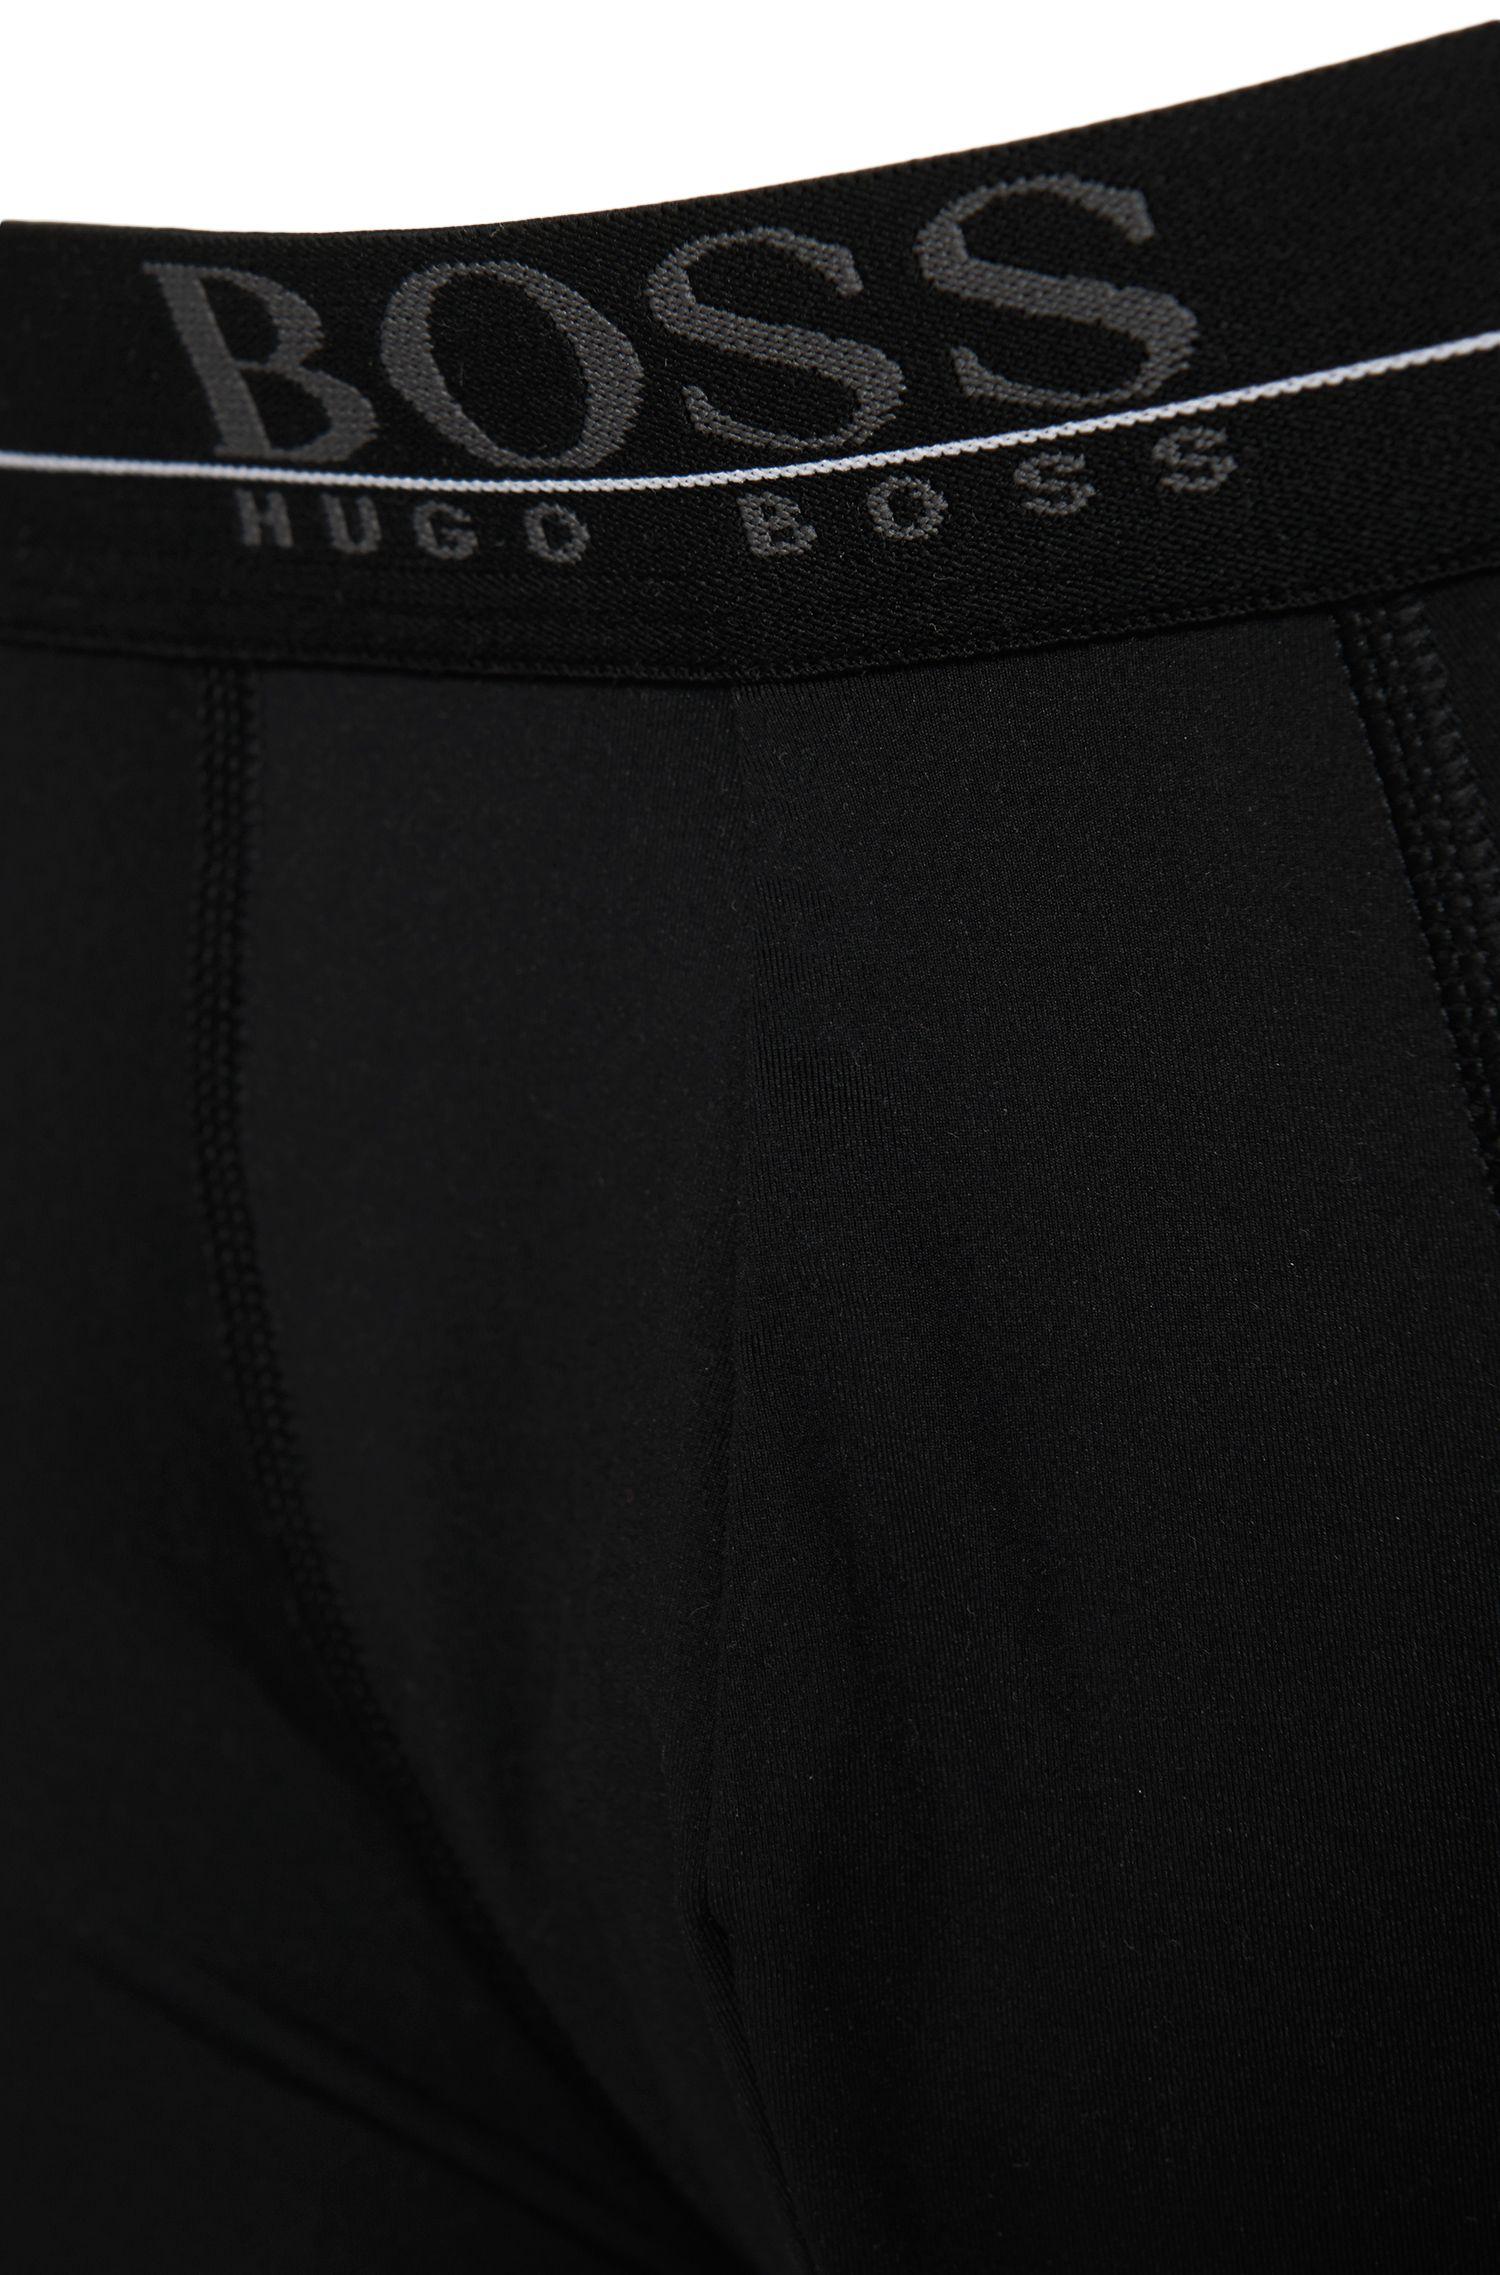 Microfiber Trunk | Boxer EW BM, Black